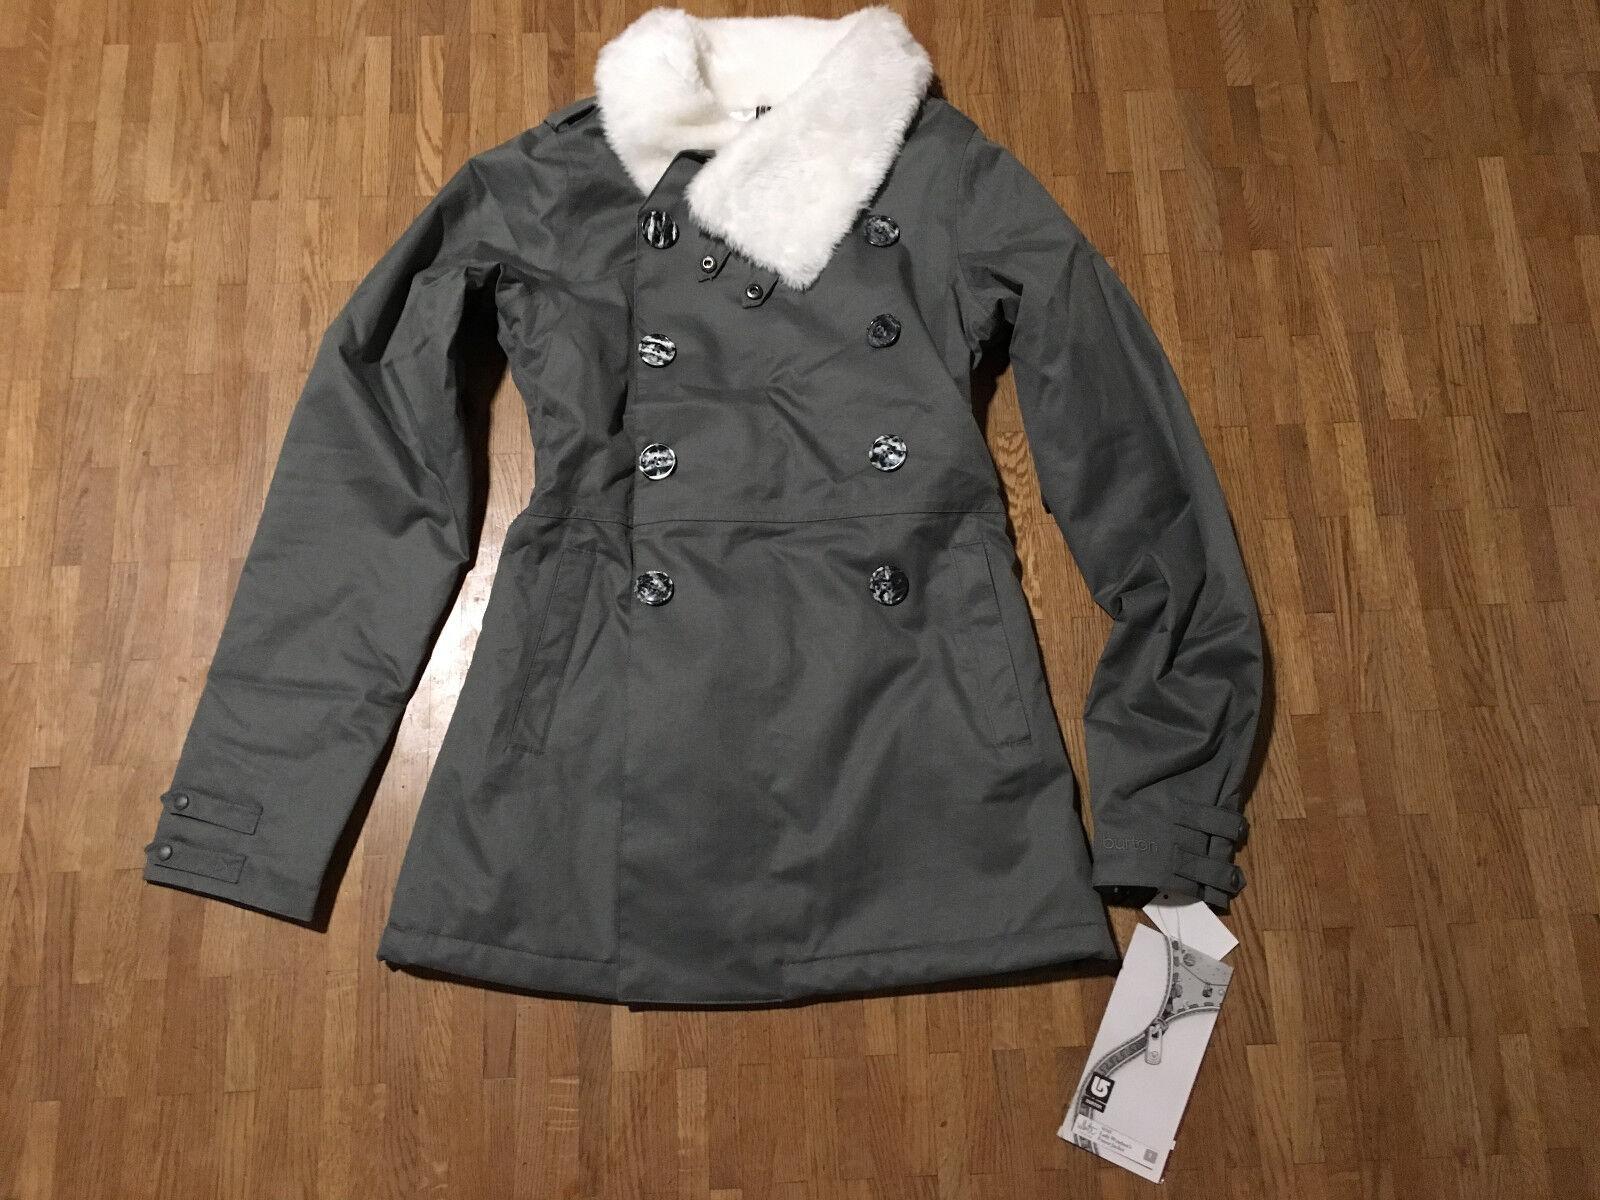 BURTON Lady Windsor`s Finest Jacket WTC Gr. 34 Weiß Collection Snowboard Jacke